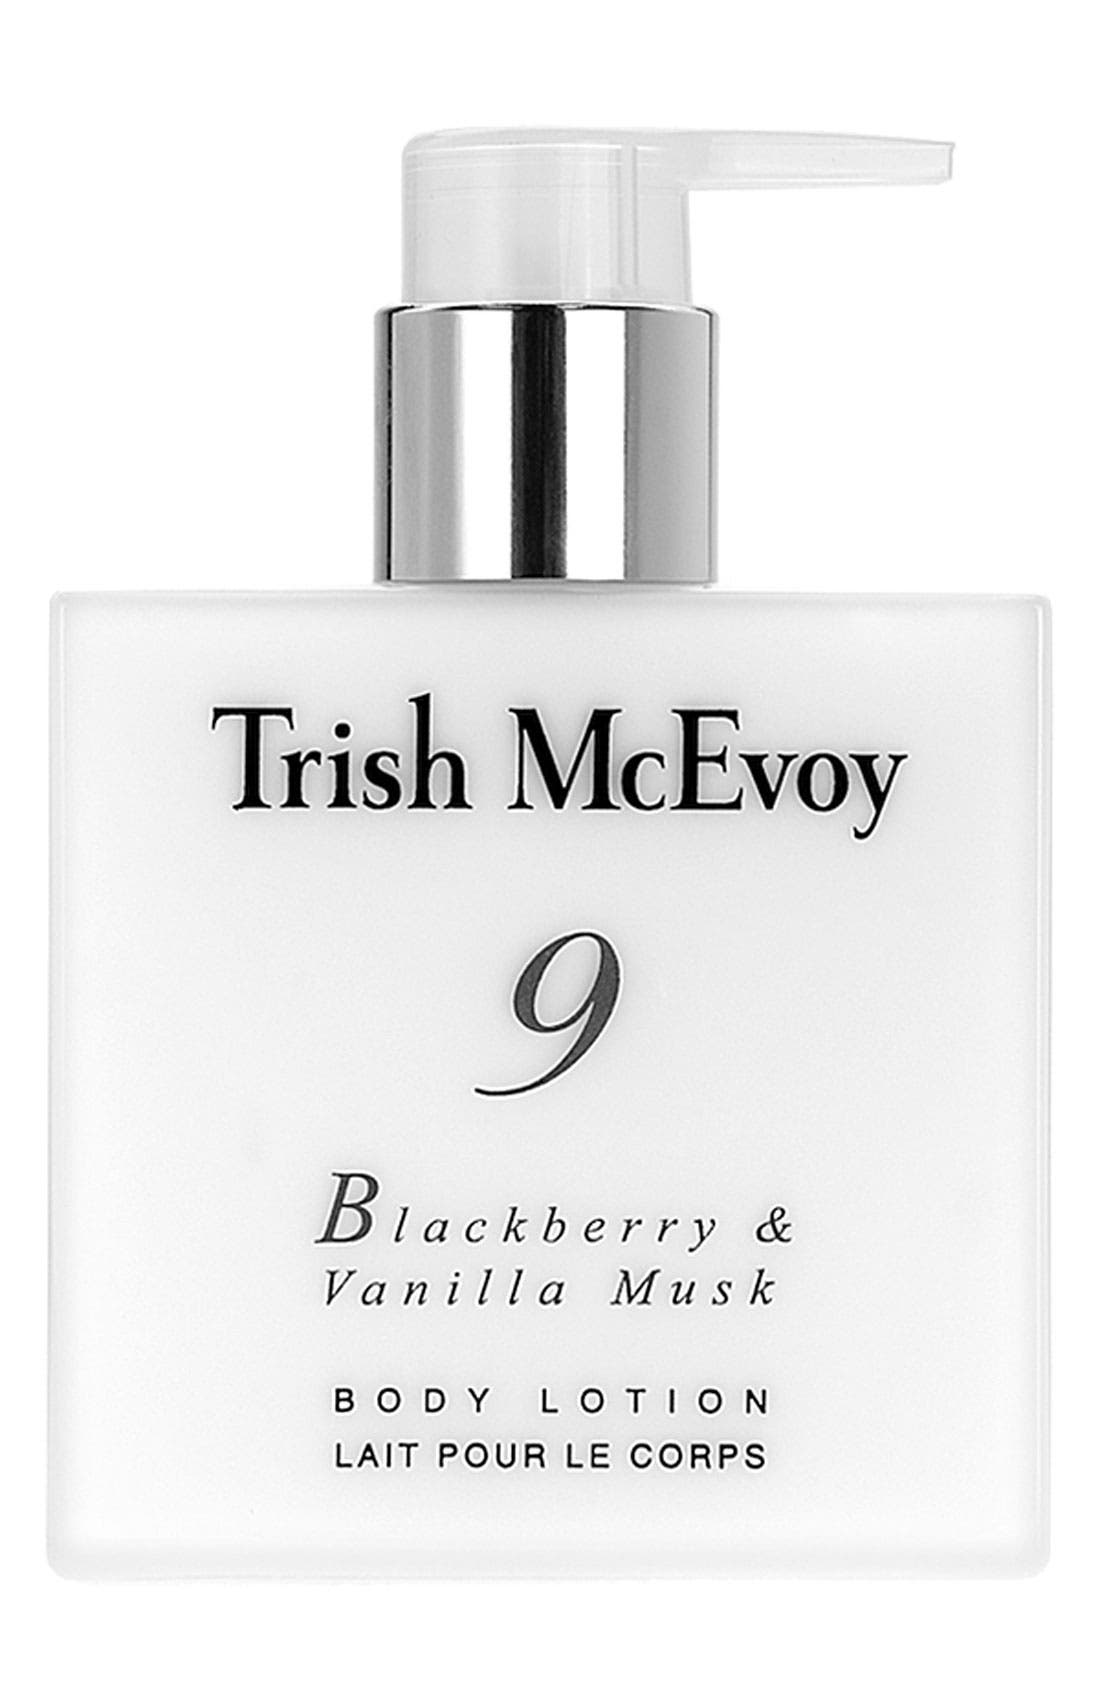 Trish McEvoy 'No. 9 Blackberry & Vanilla Musk' Body Lotion